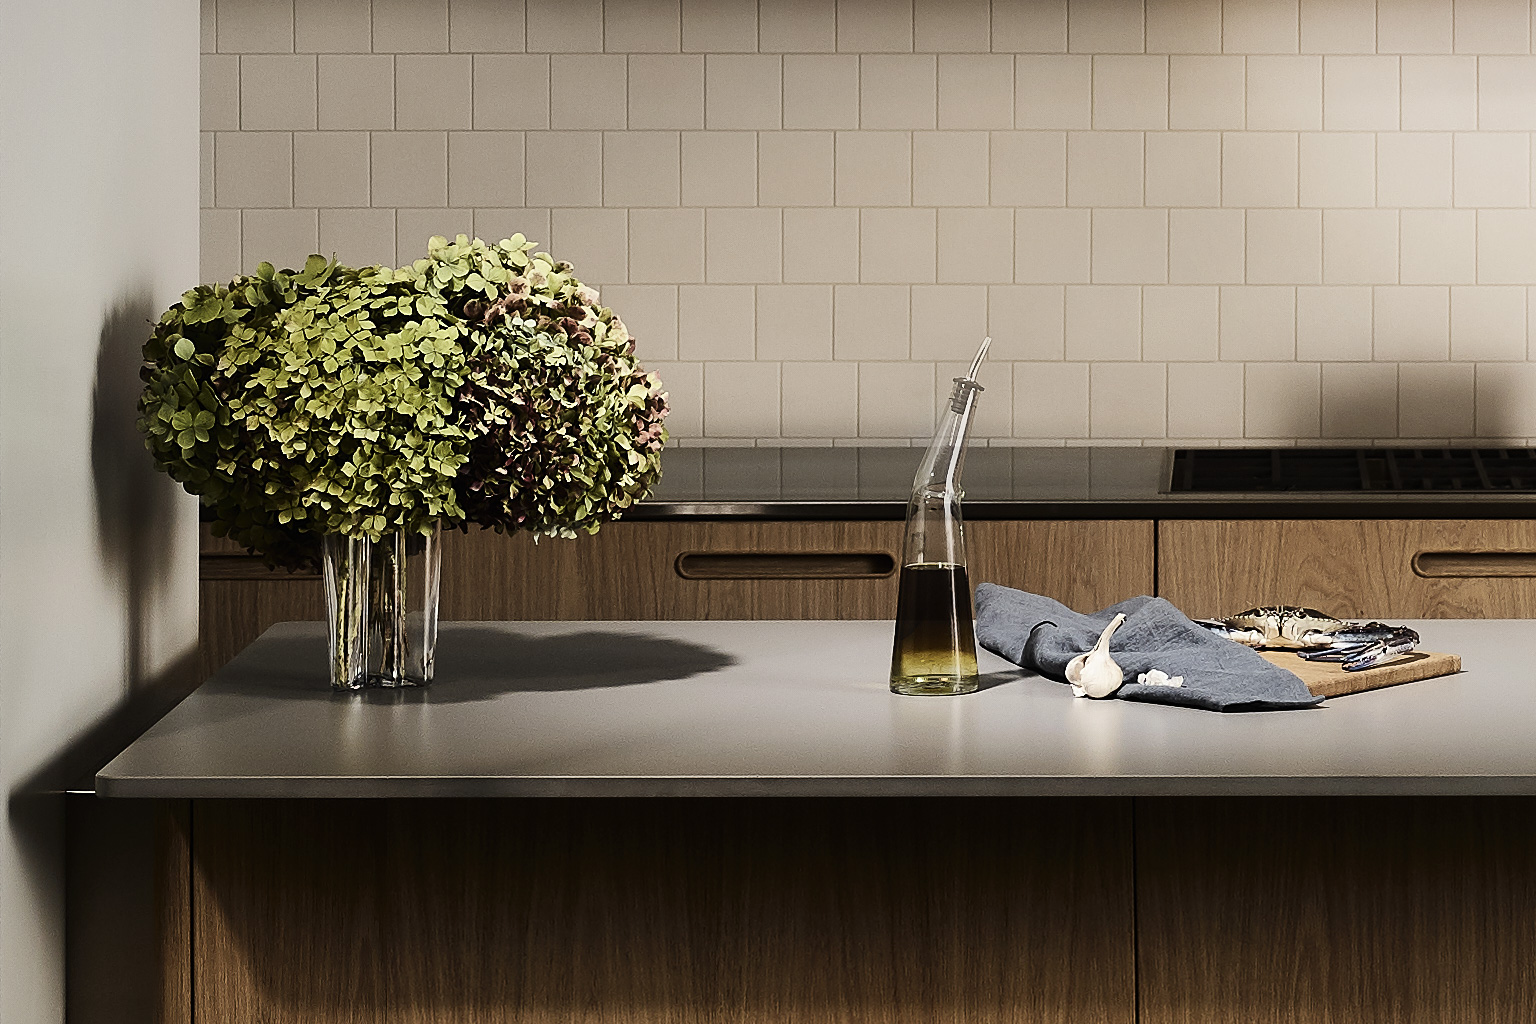 Tableau Cantilever DesignOffice Kitchen System Australia (1).JPG